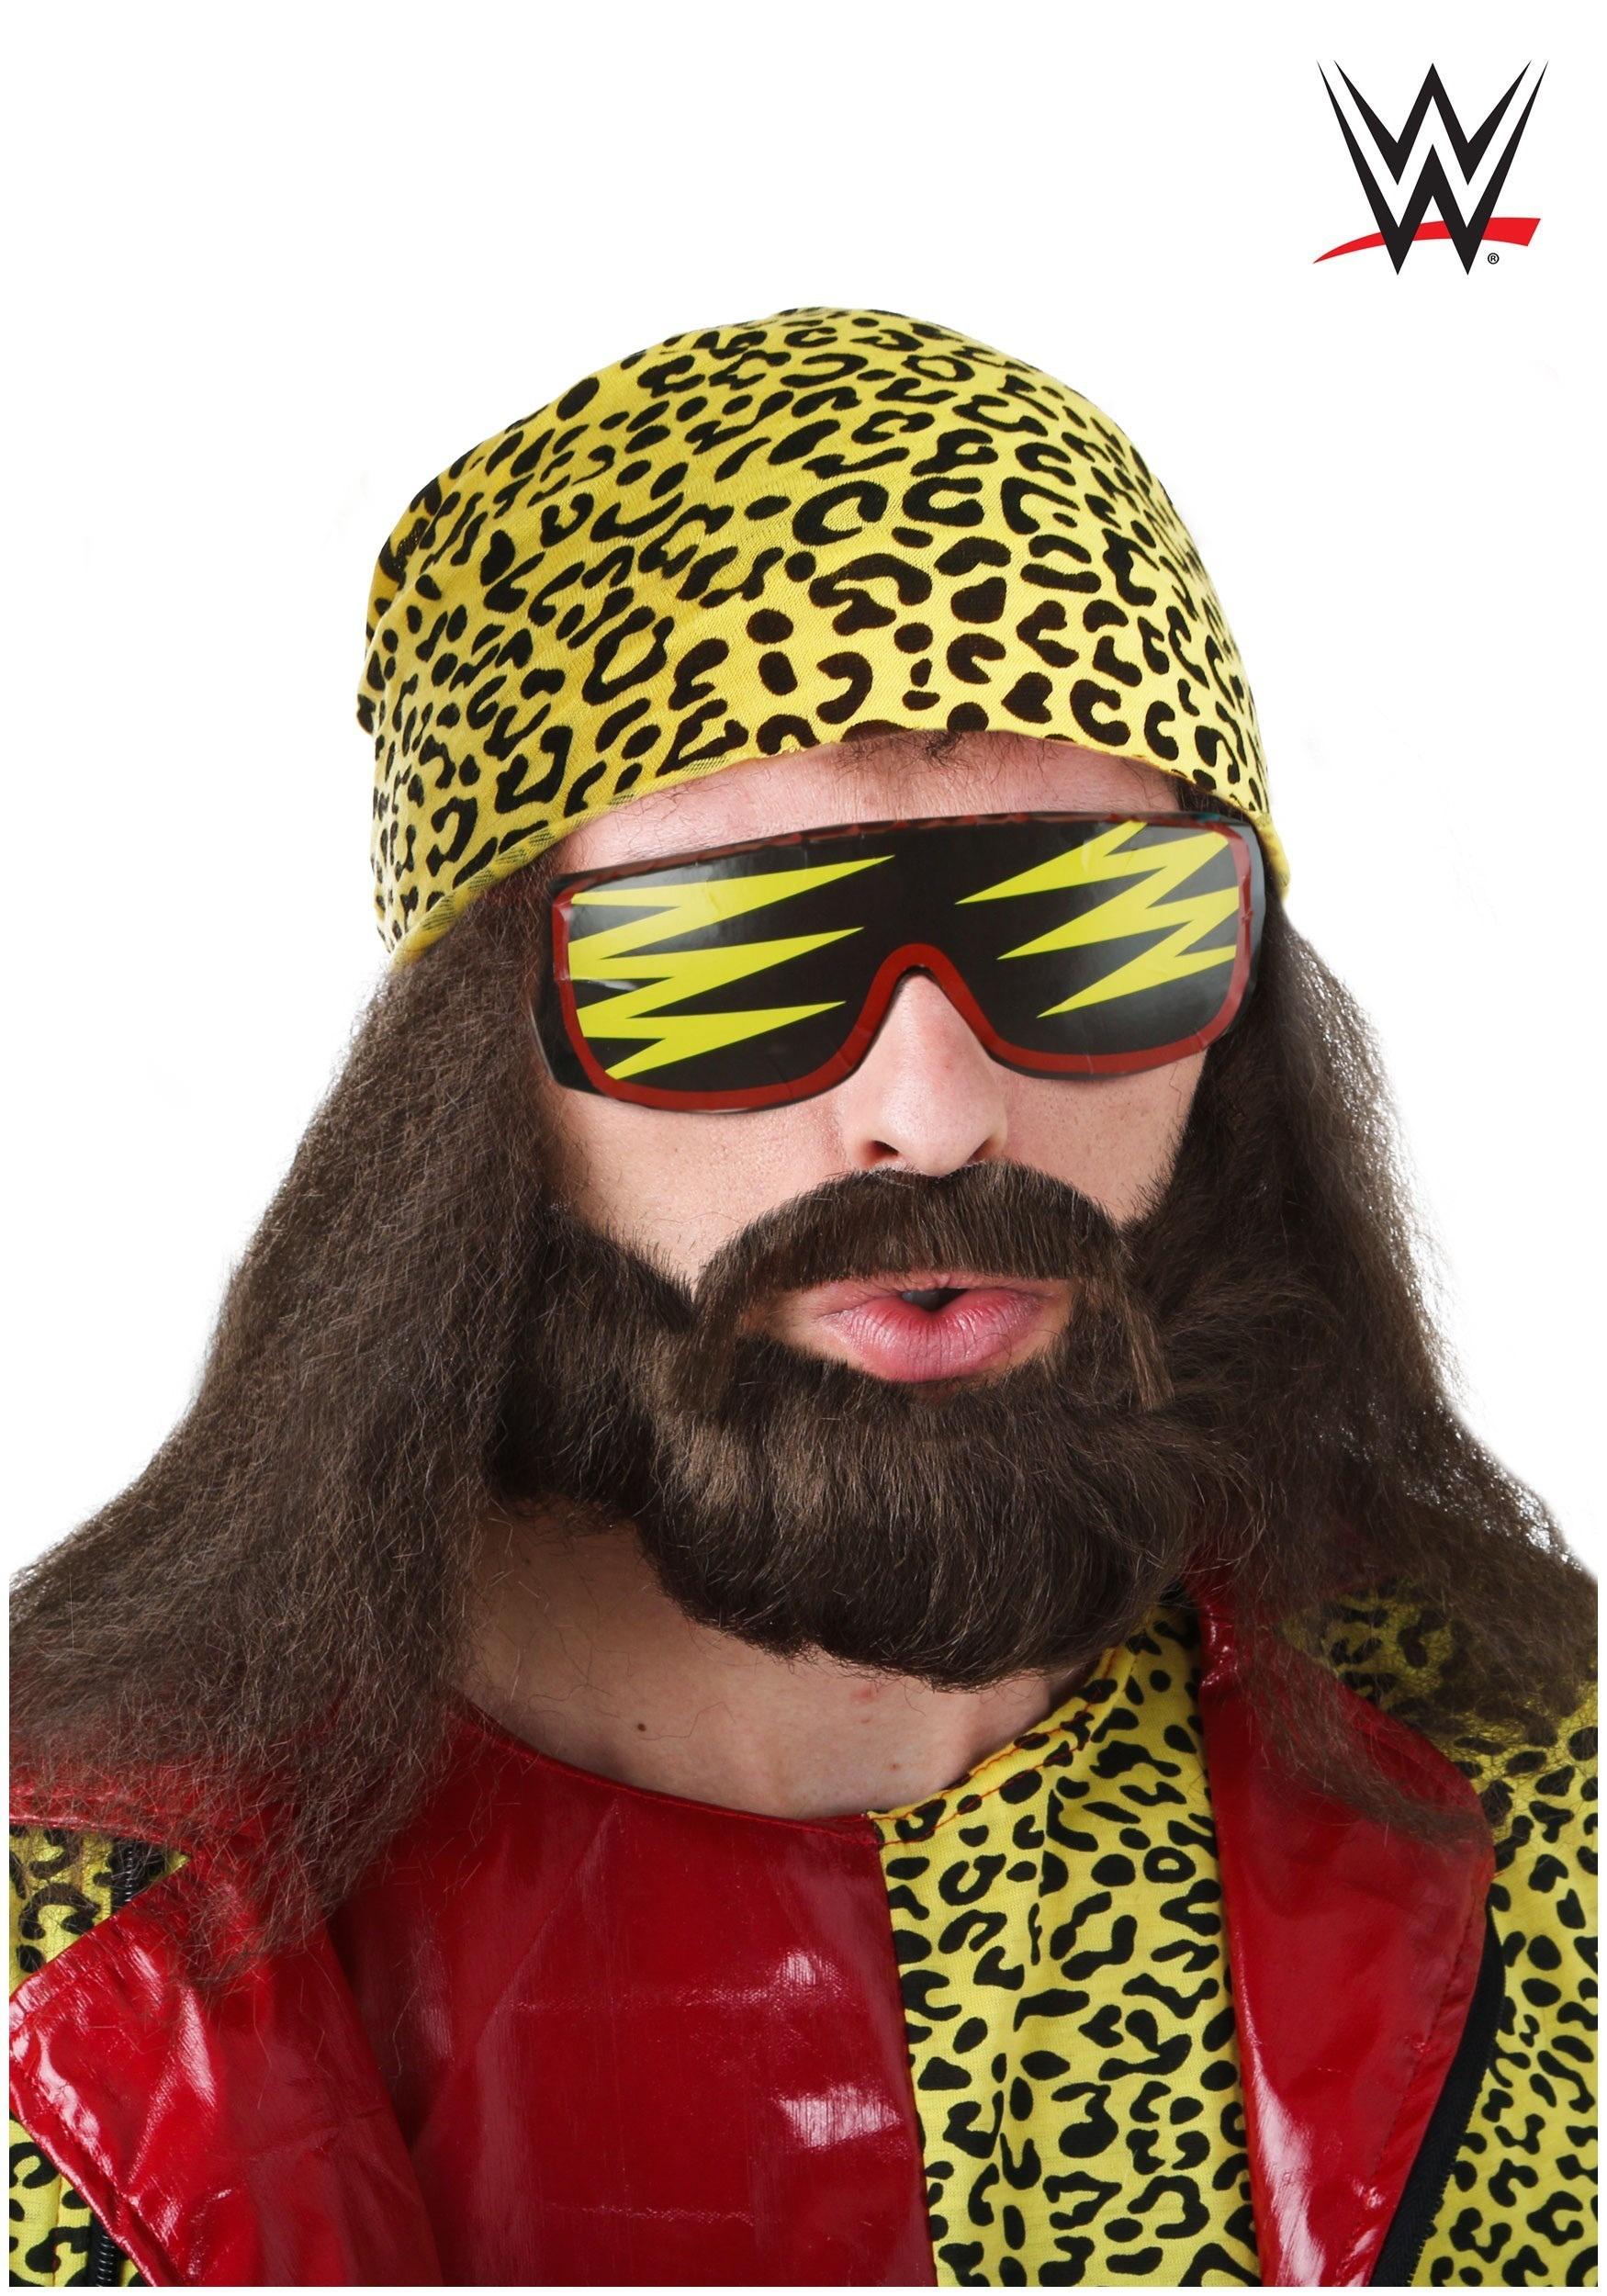 randy savage wrestling